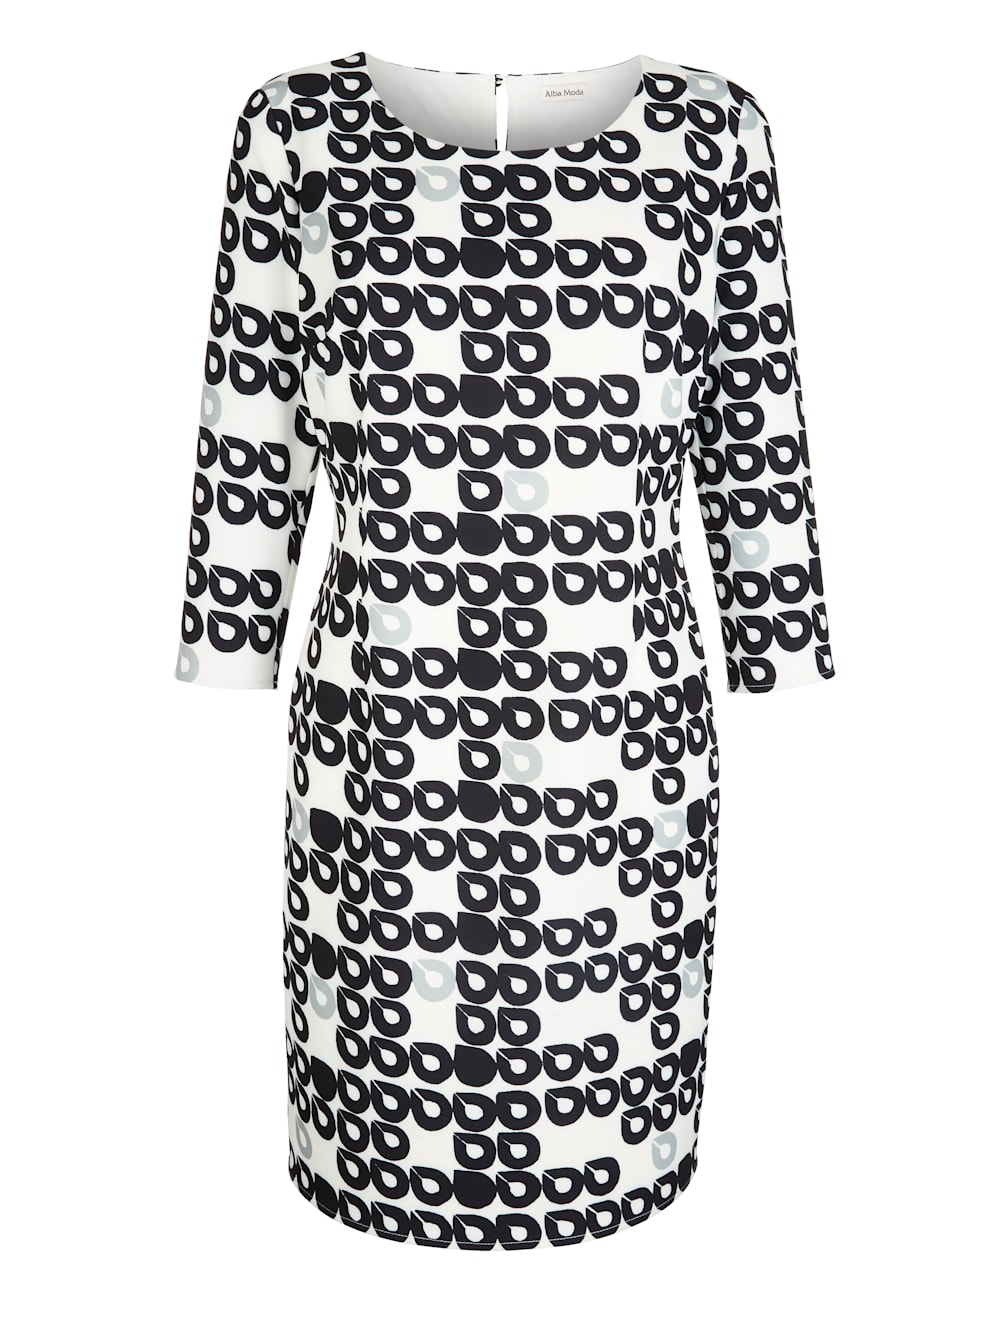 alba moda kleid im kreise-dessin allover | alba moda